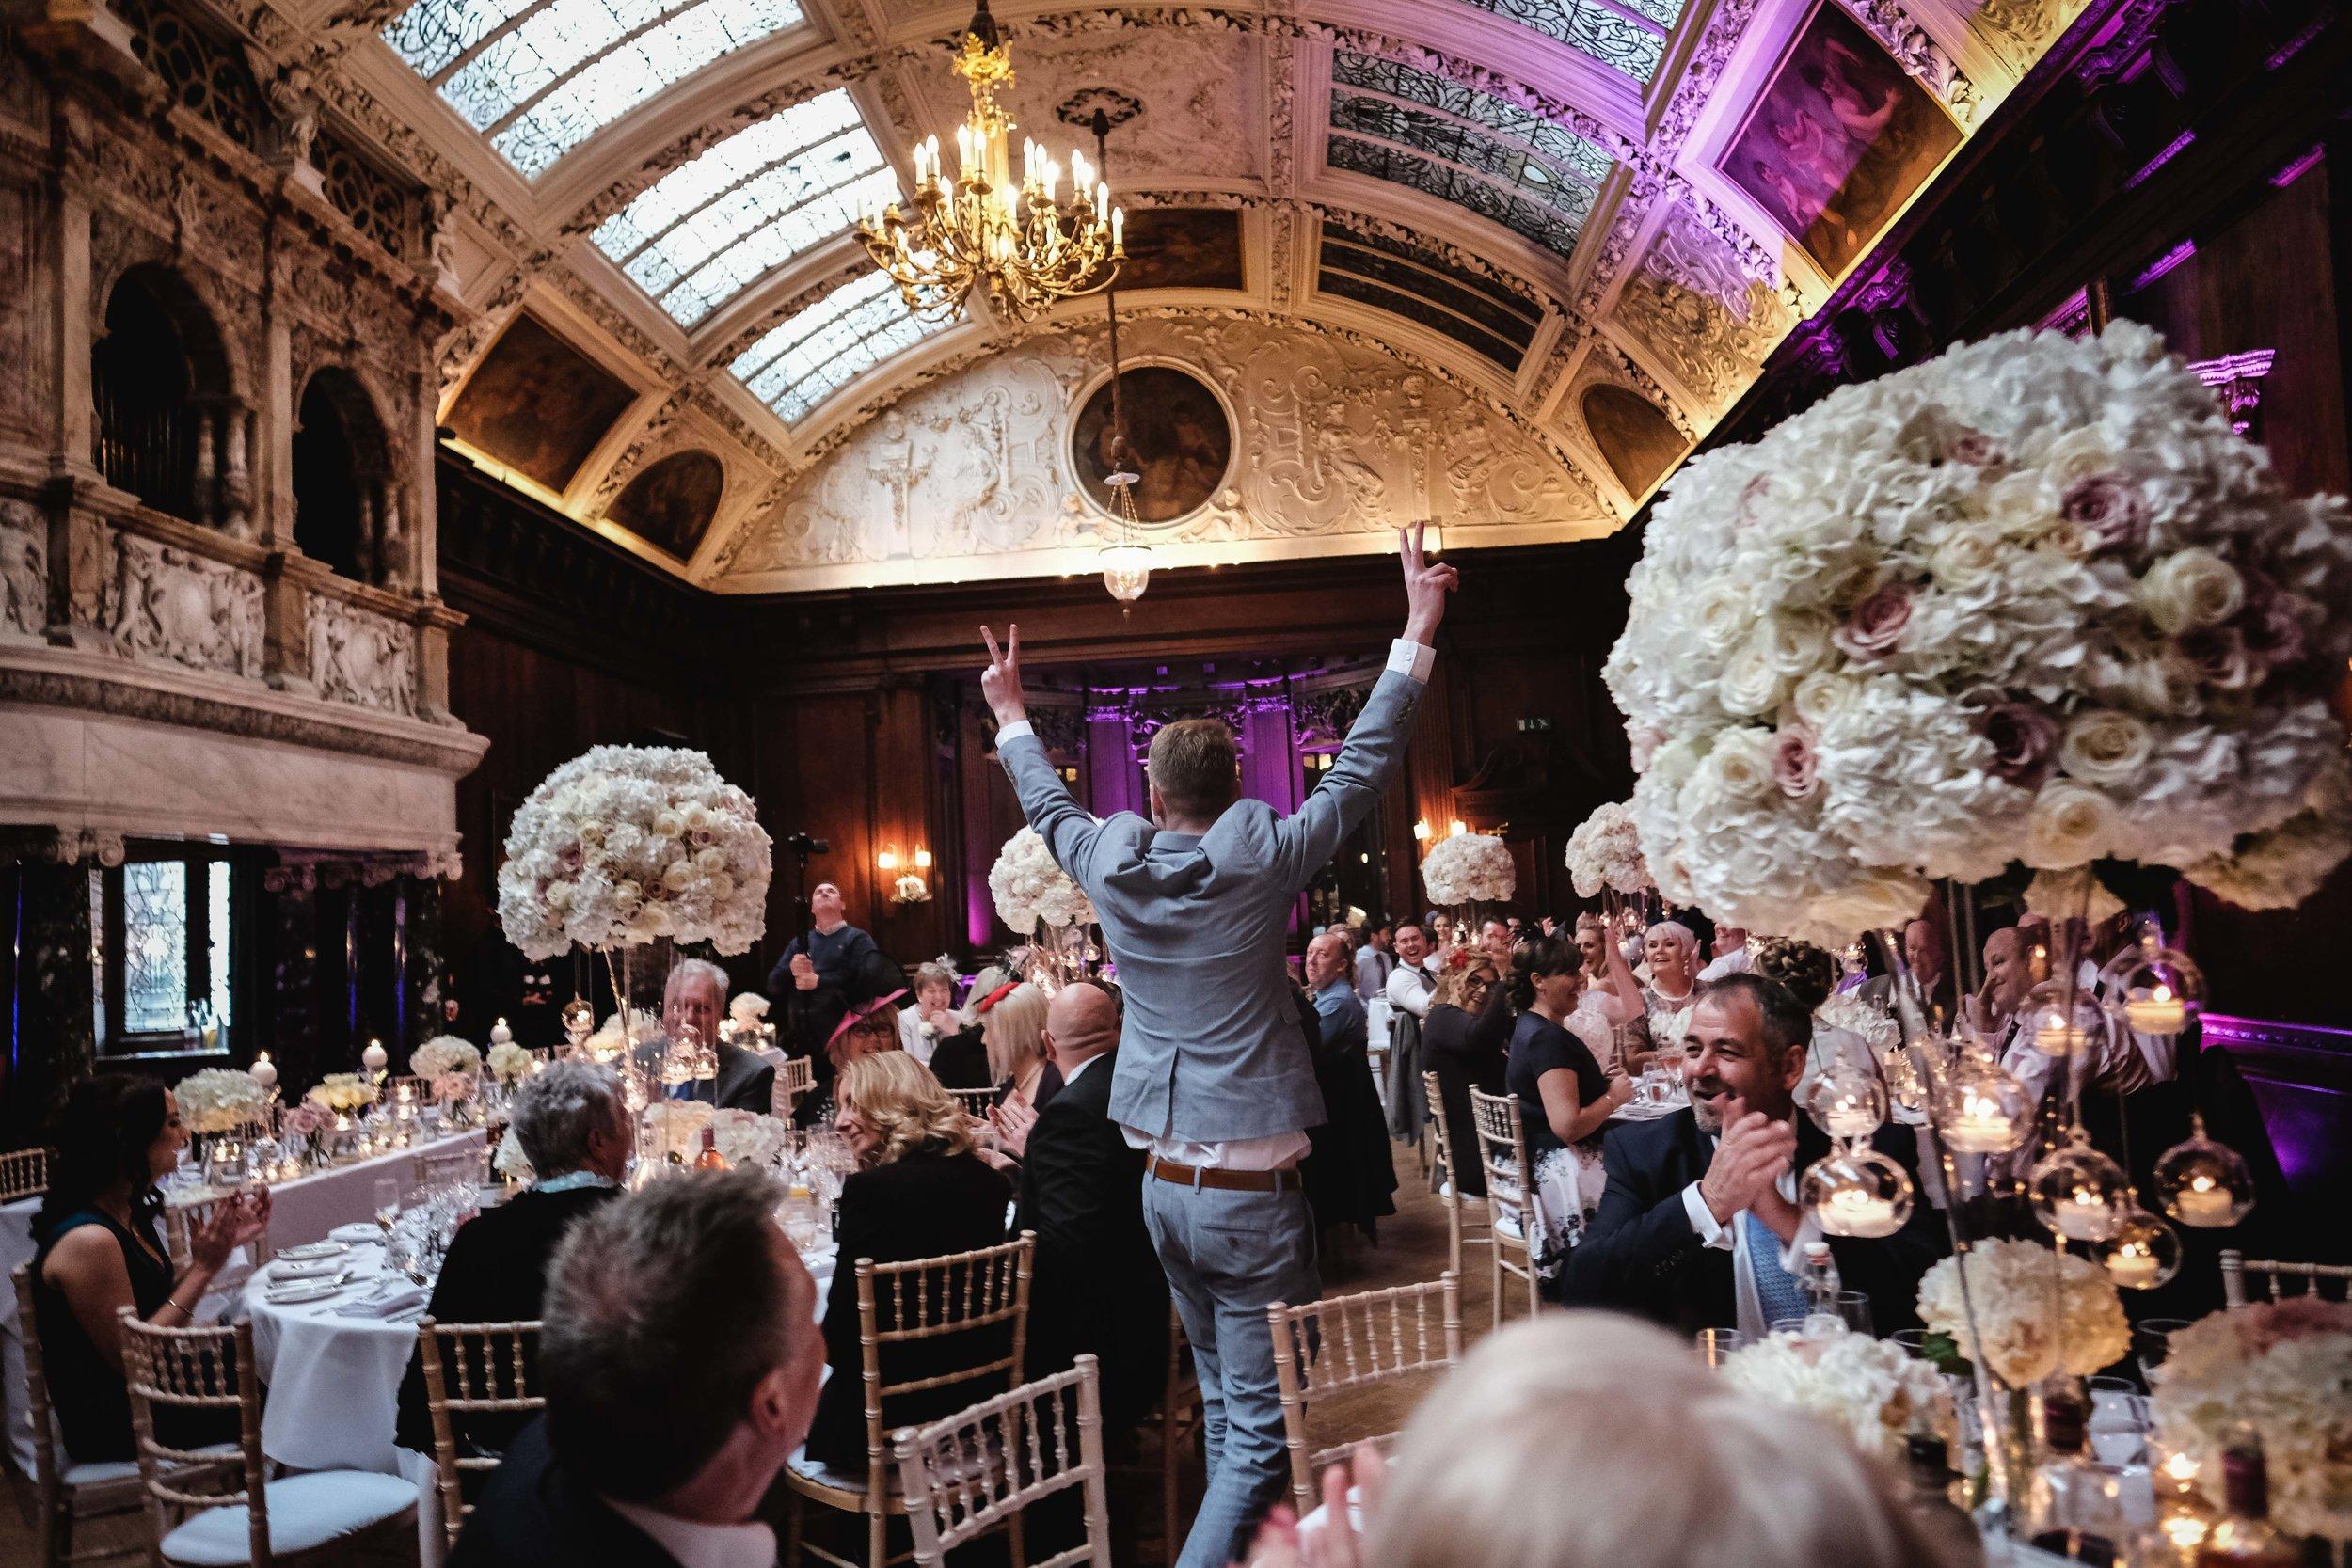 Thornton manor wedding photography cheshire wedding photographer liverpool manchester warrington chester wirral wedding BLOG (61 of 108).jpg